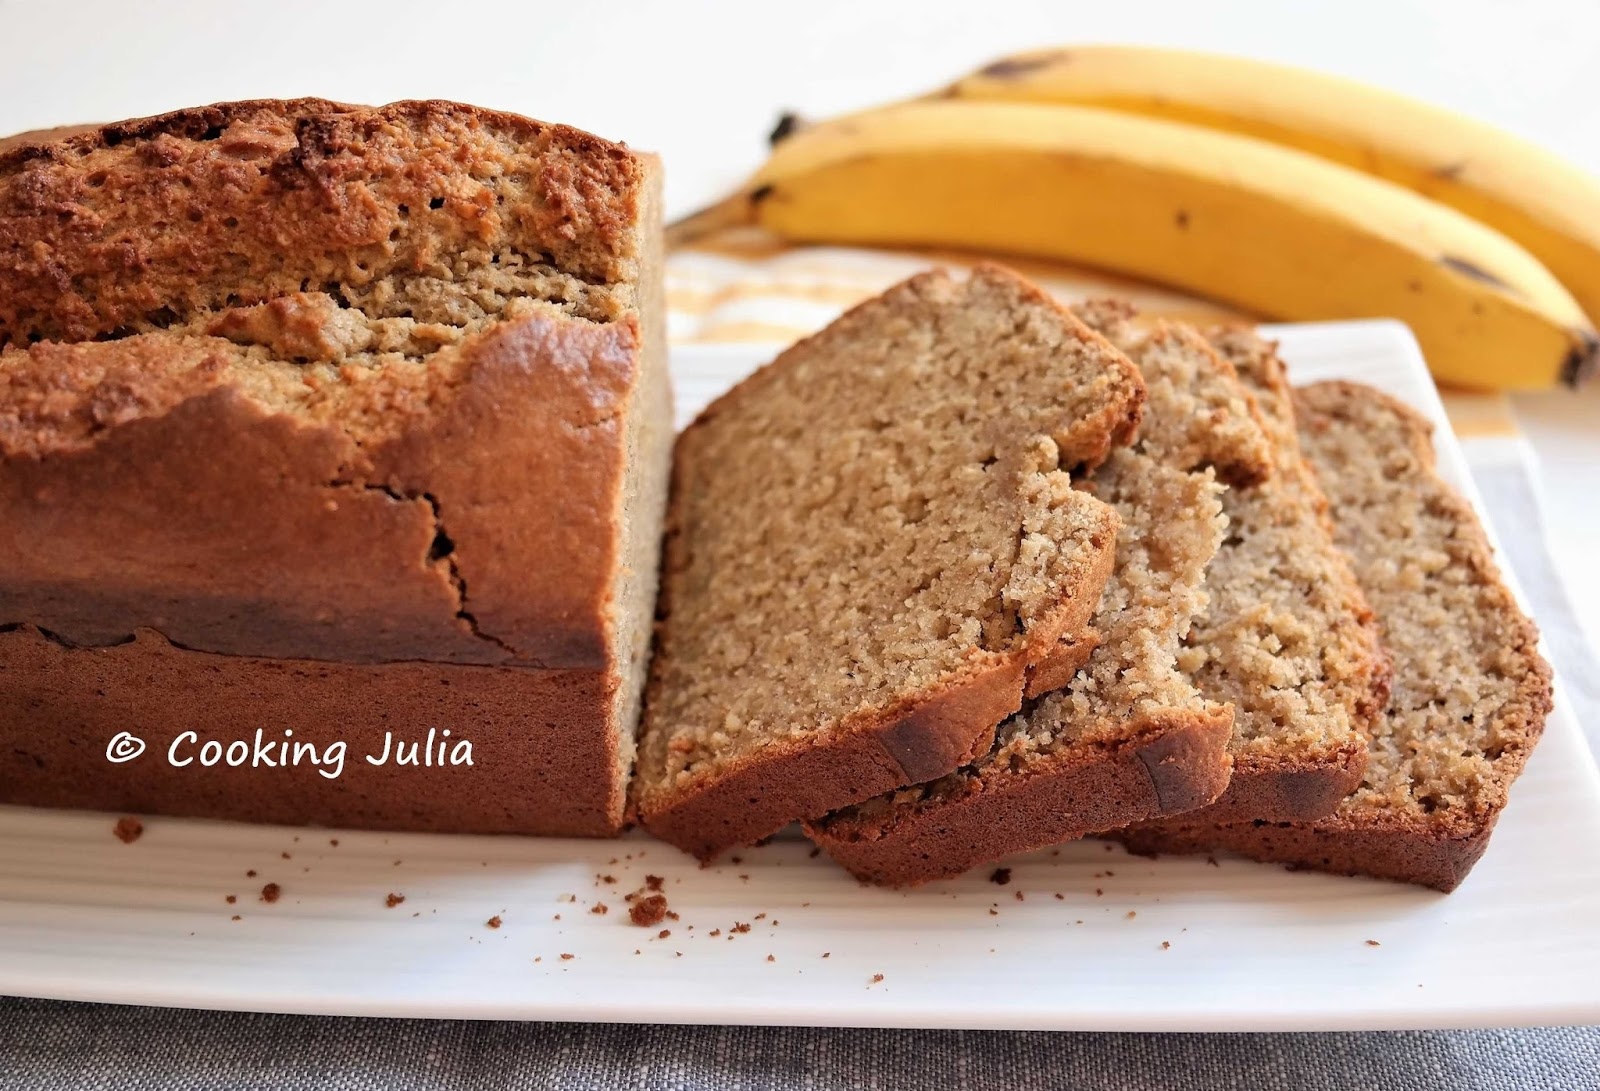 cooking julia banana bread healthy. Black Bedroom Furniture Sets. Home Design Ideas